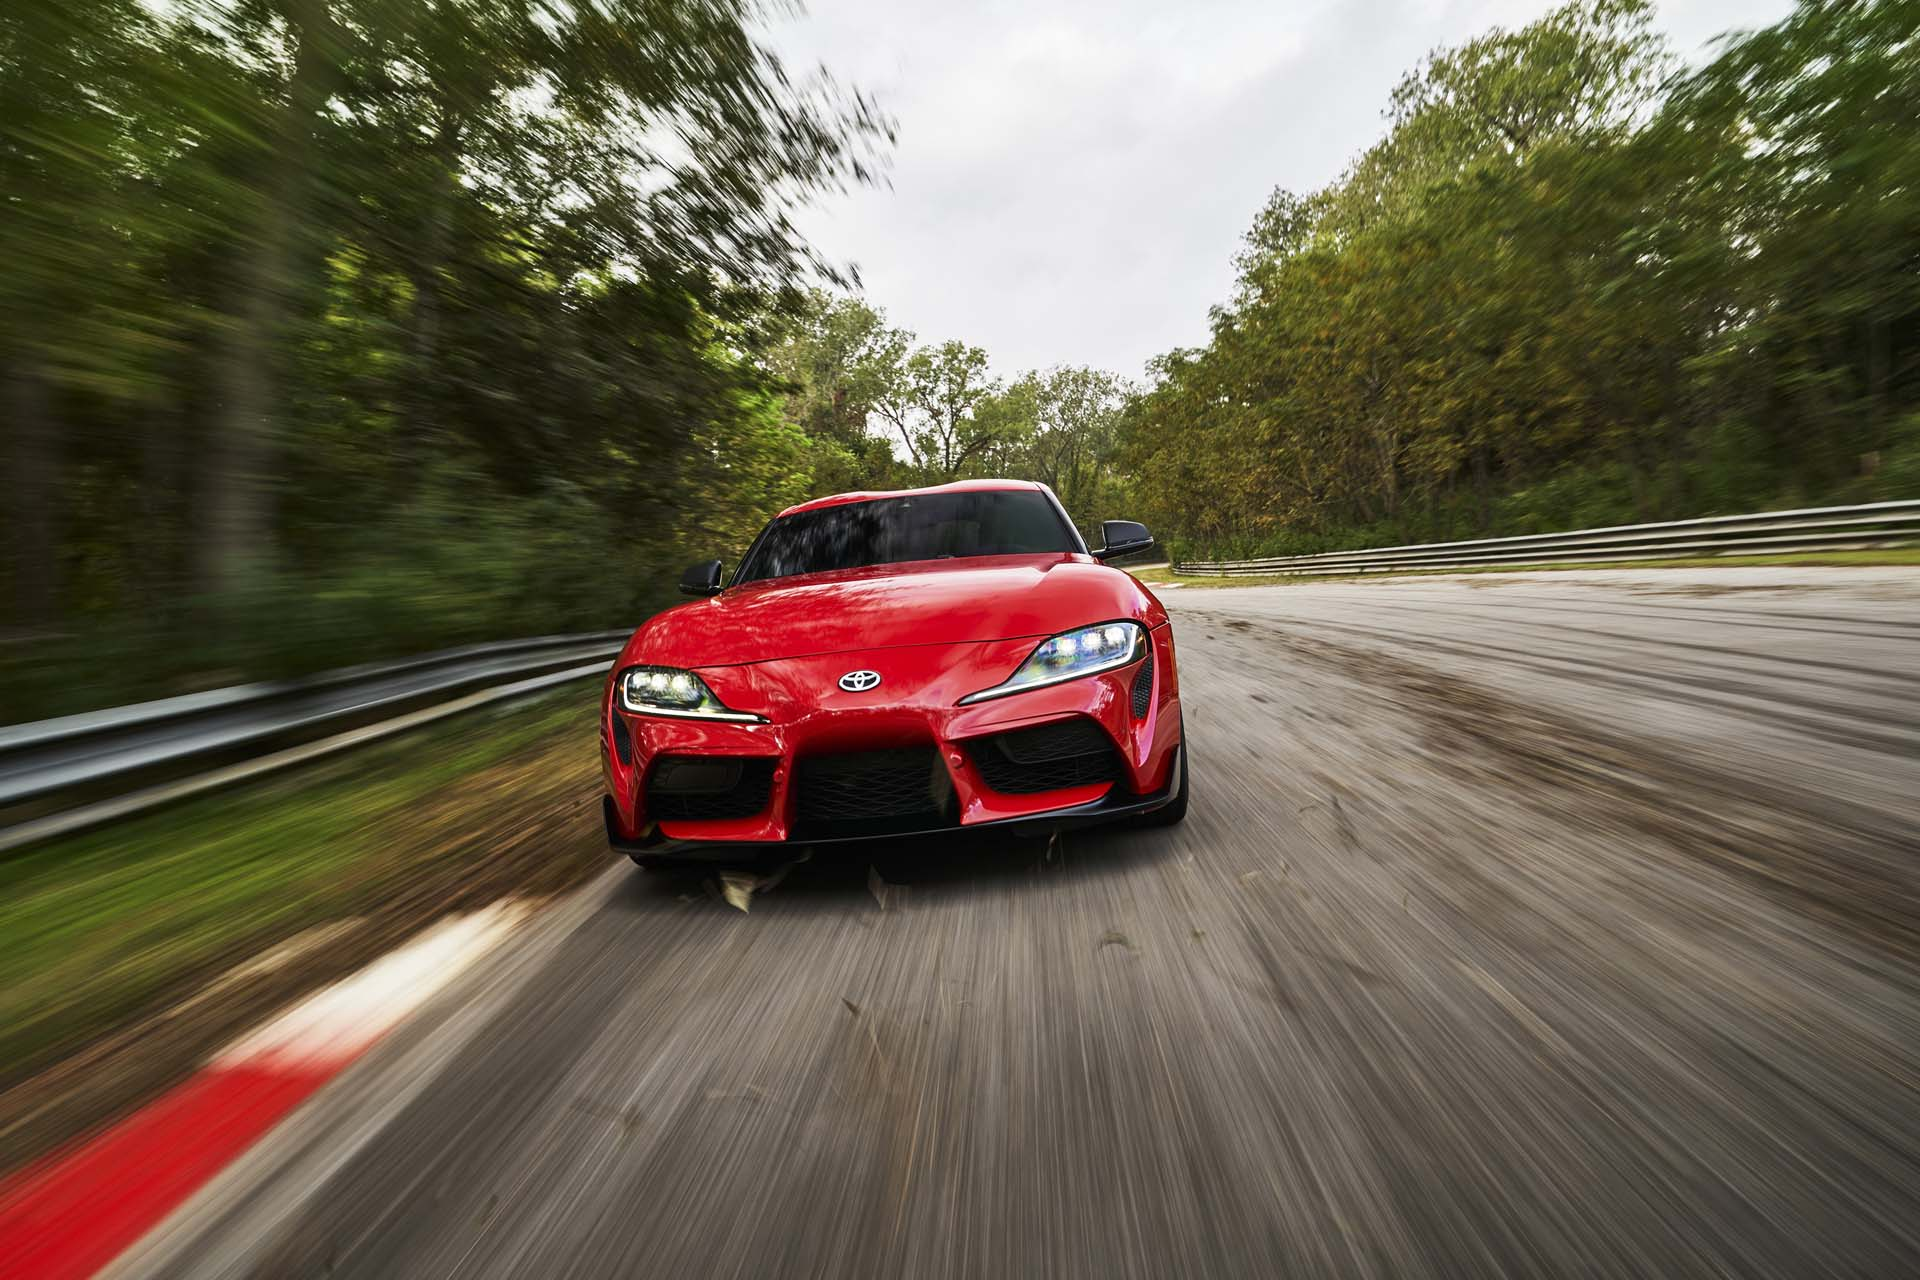 2020 Toyota Supra Inline 6 Fuel Economy Estimates Nearly As Thrifty